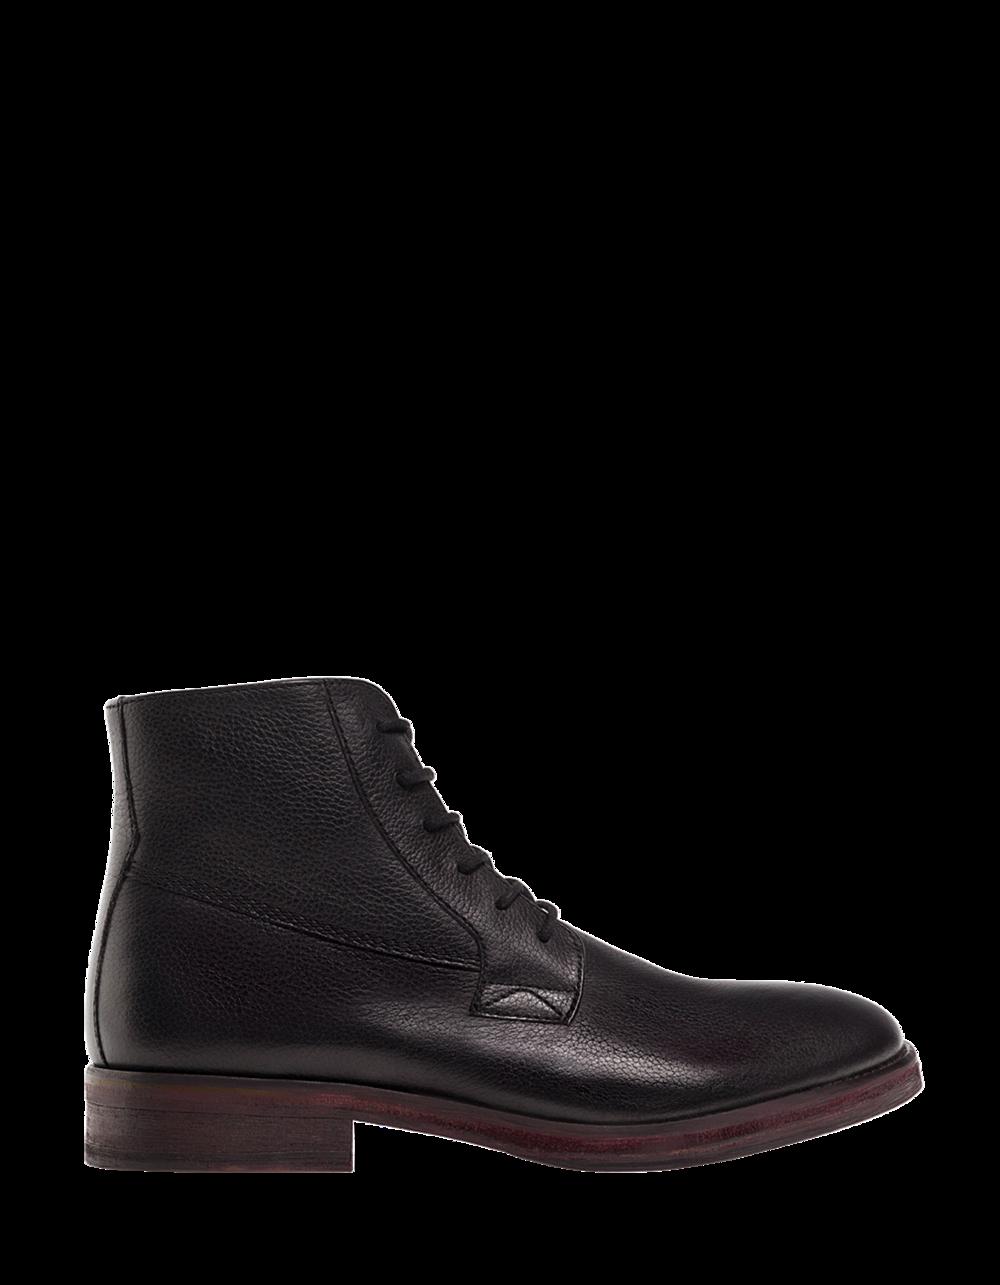 StradivariusMan_shoes (5).png